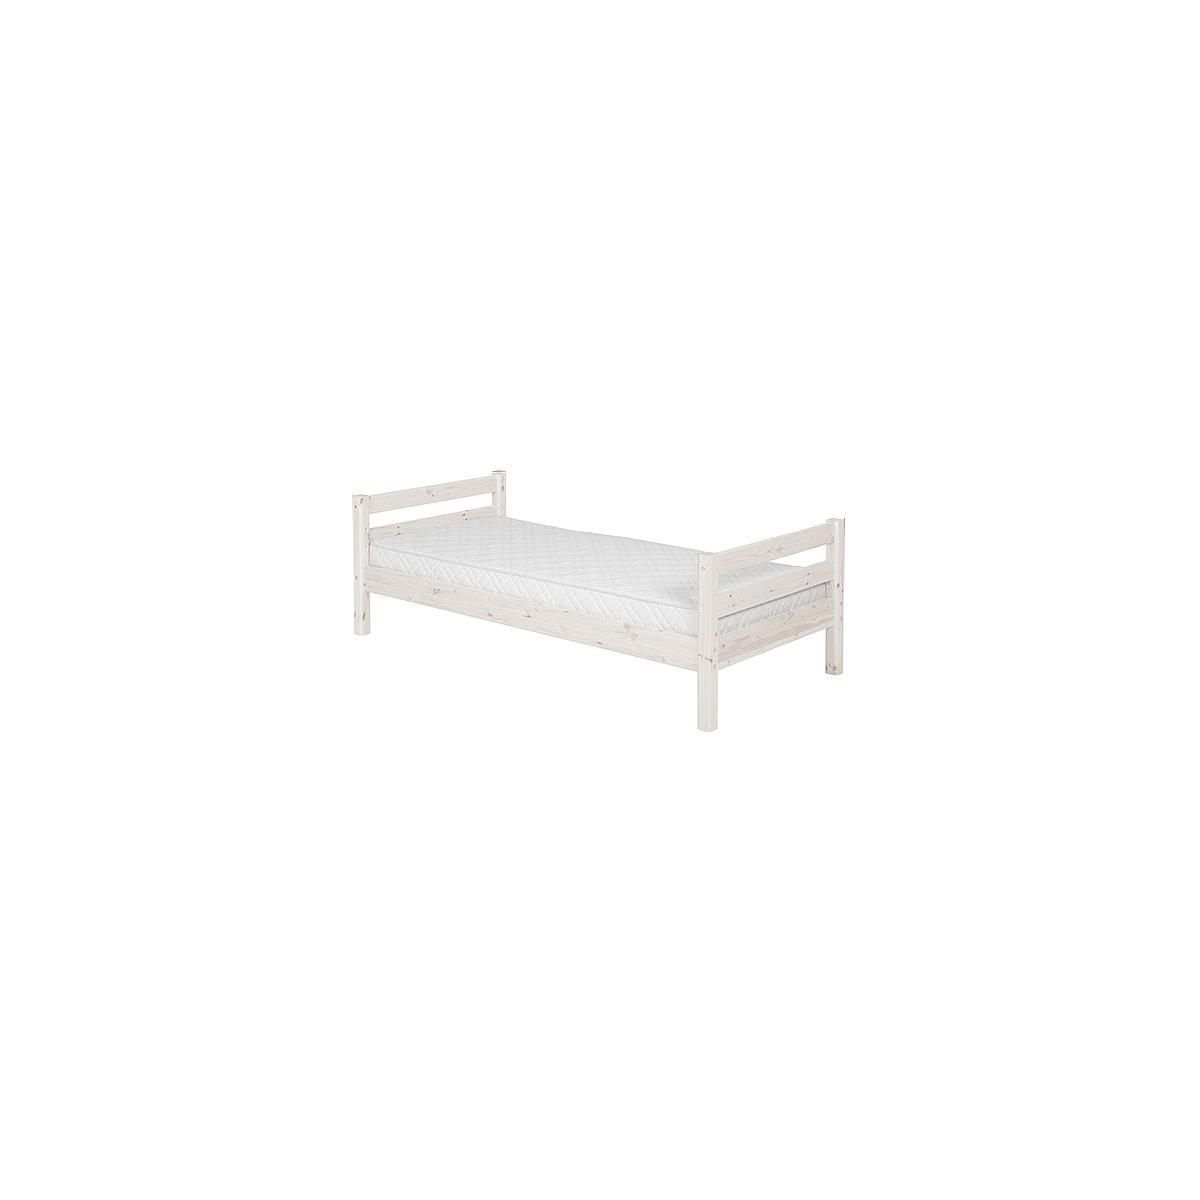 CLASSIC LINE by Flexa Lit de base blanchi 90x200 cm